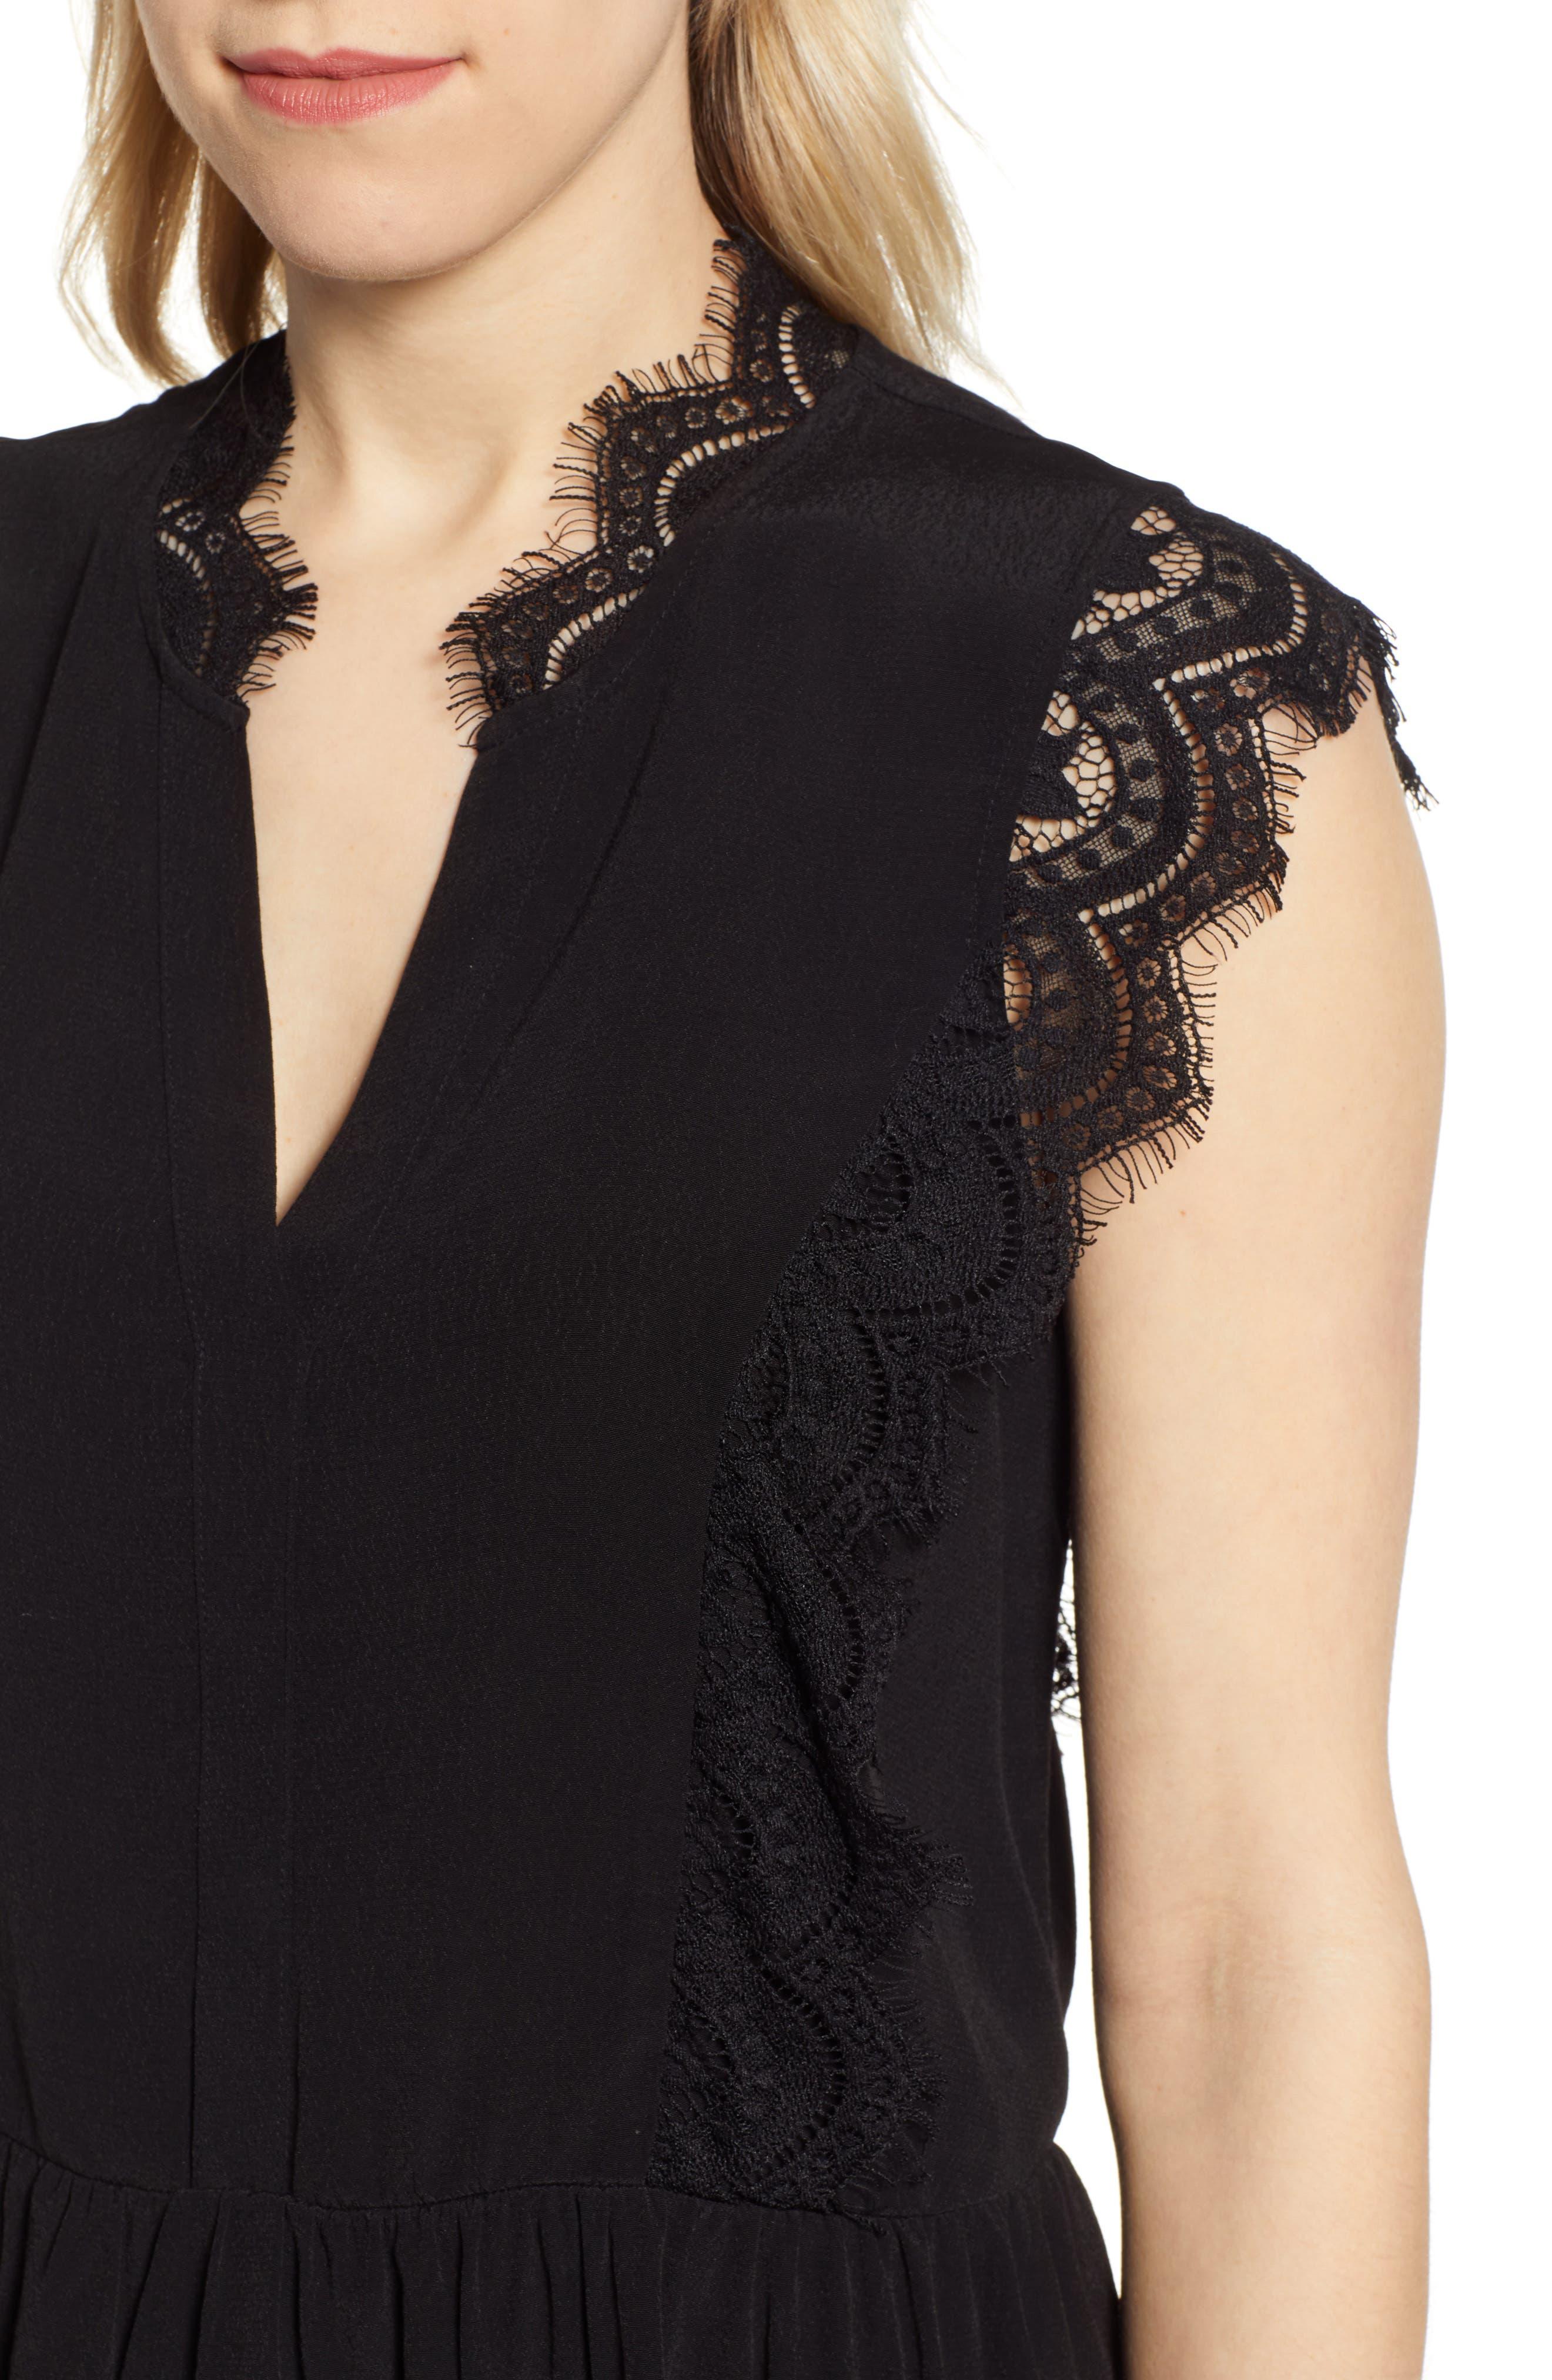 GIBSON,                             x International Women's Day Hoang-Kim Eyelash Lace Detail Date Top,                             Alternate thumbnail 4, color,                             BLACK